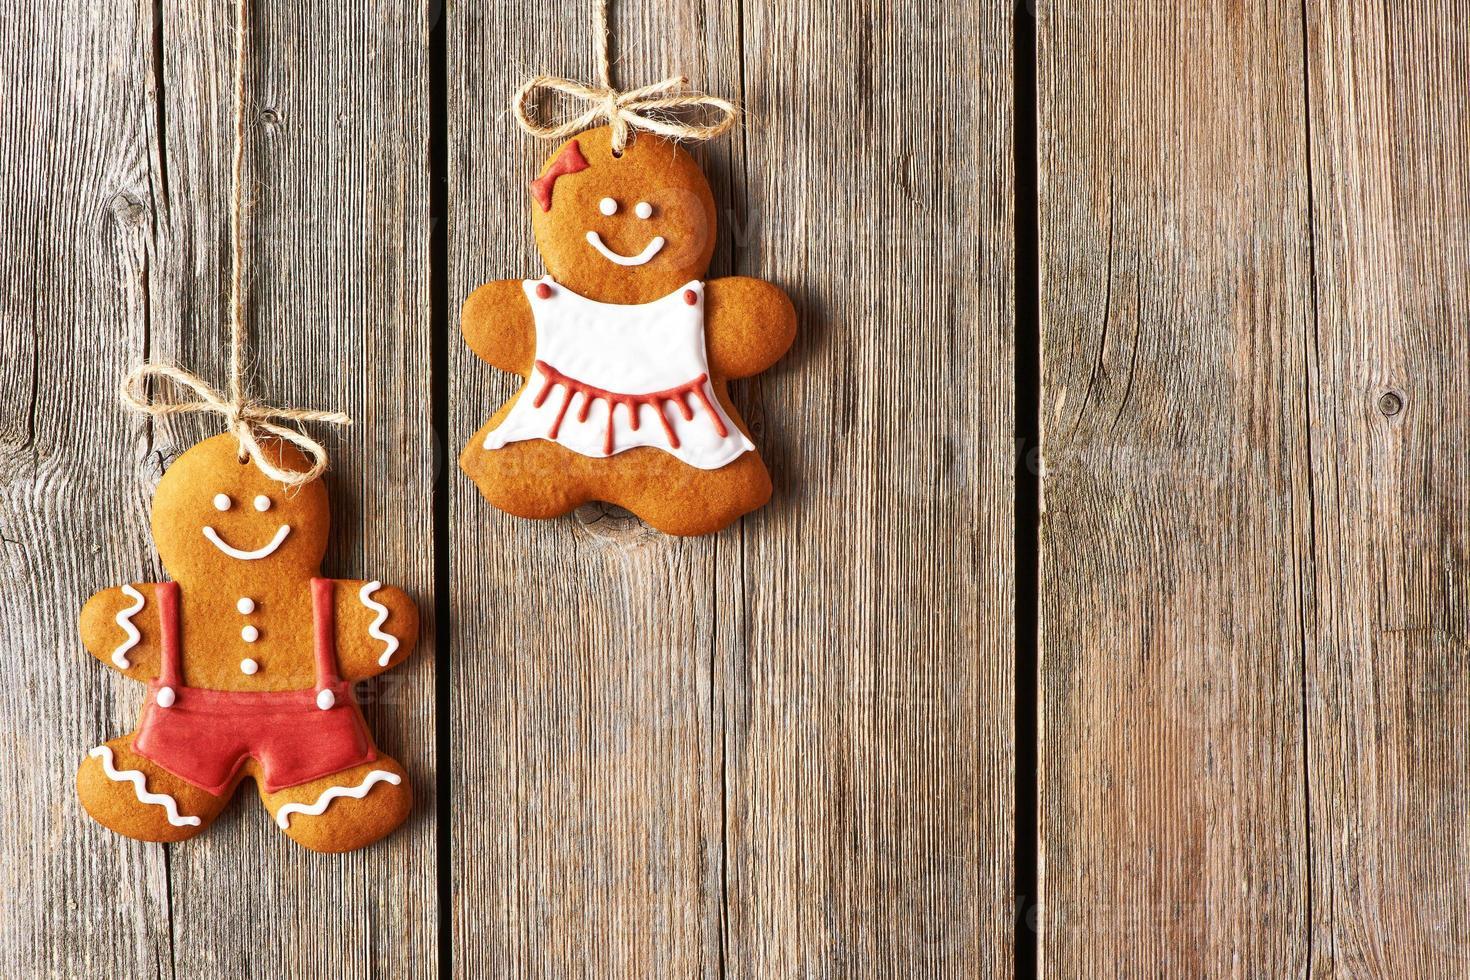 natal caseiro pão de mel casal cookies foto